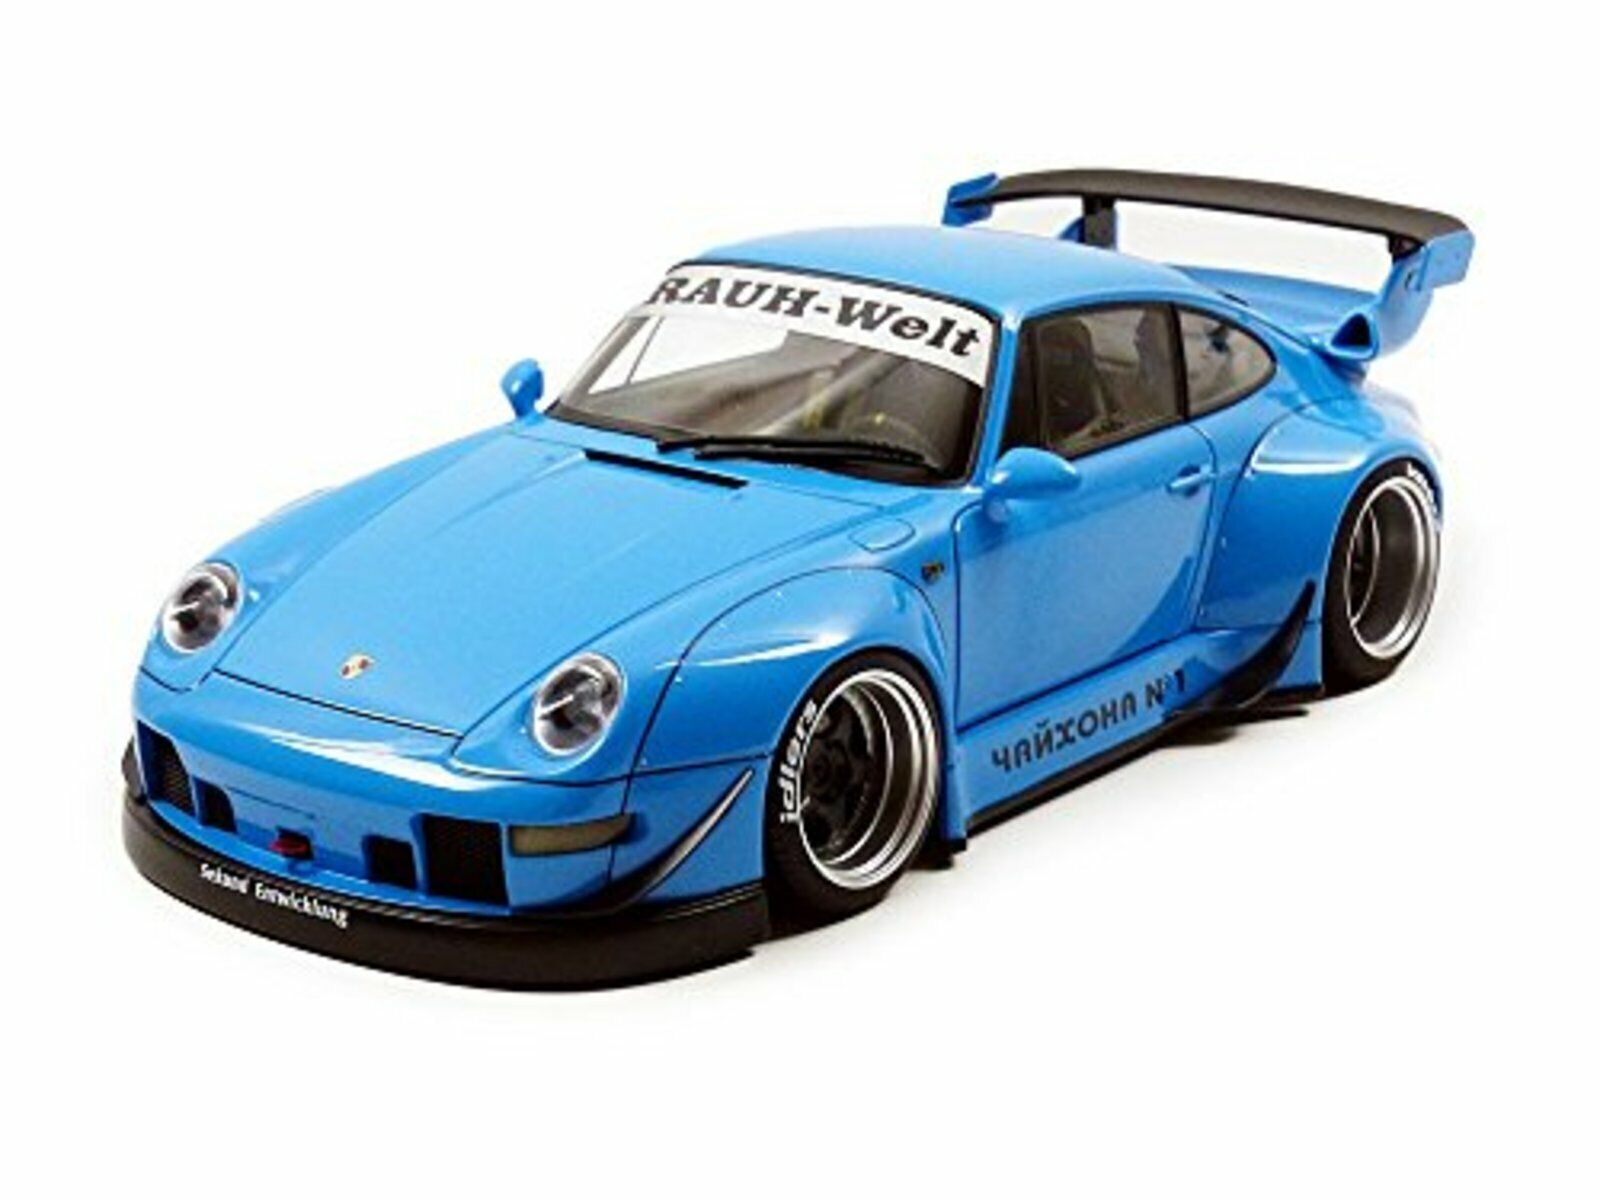 Porsche Rwb 993 azul Pistola gris Ruote 1 18 Vettura da Autoart 78152 F S